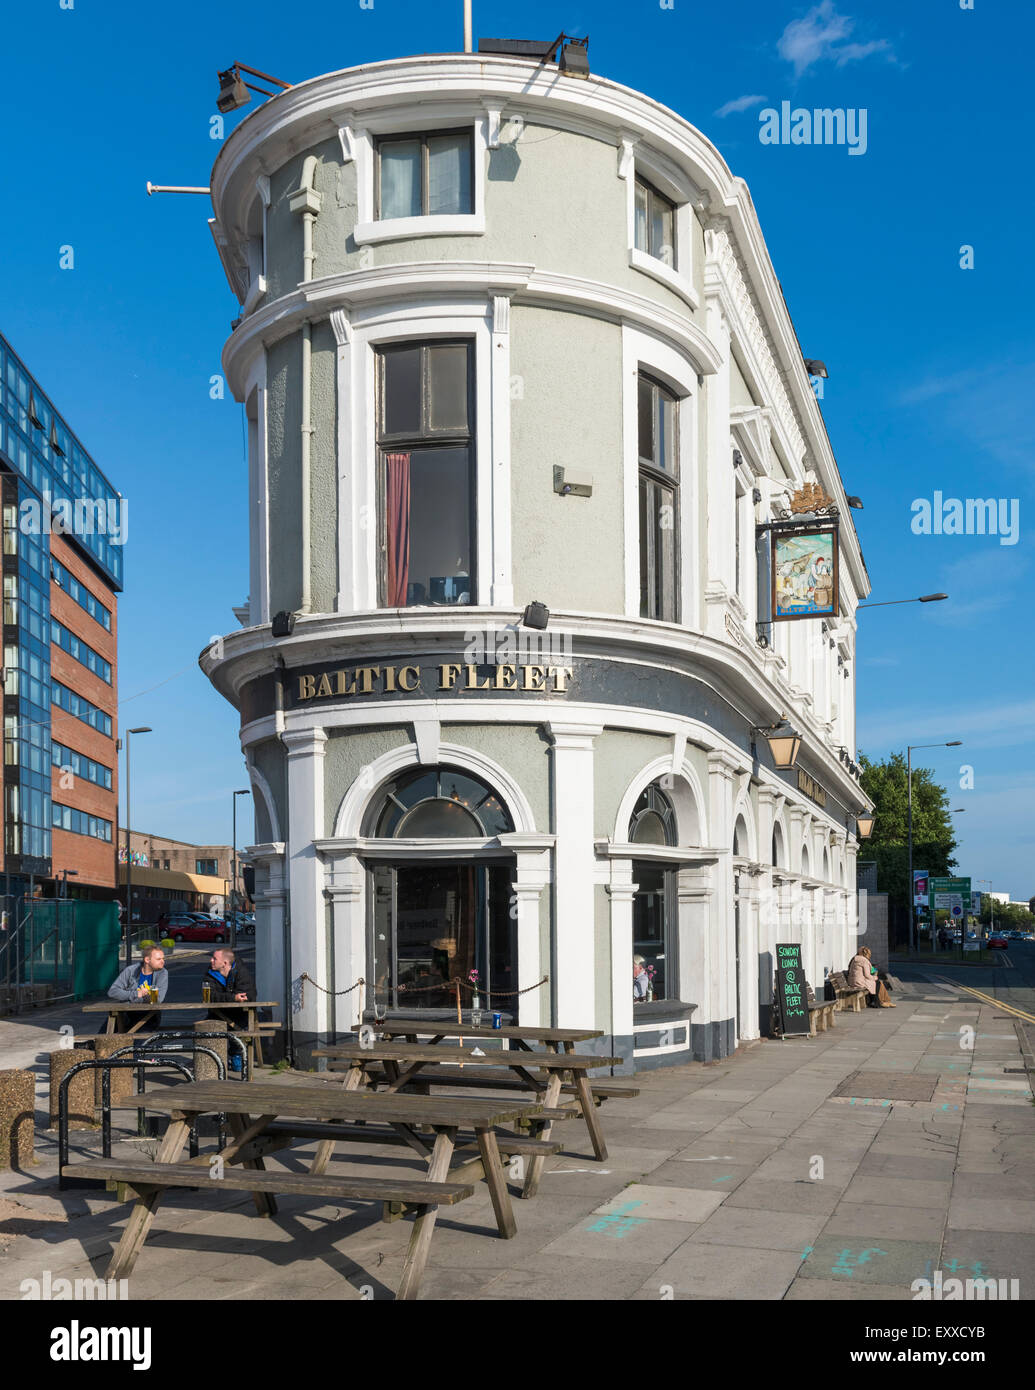 The well-known Liverpool landmark, The Baltic Fleet pub, Liverpool, UK Stock Photo